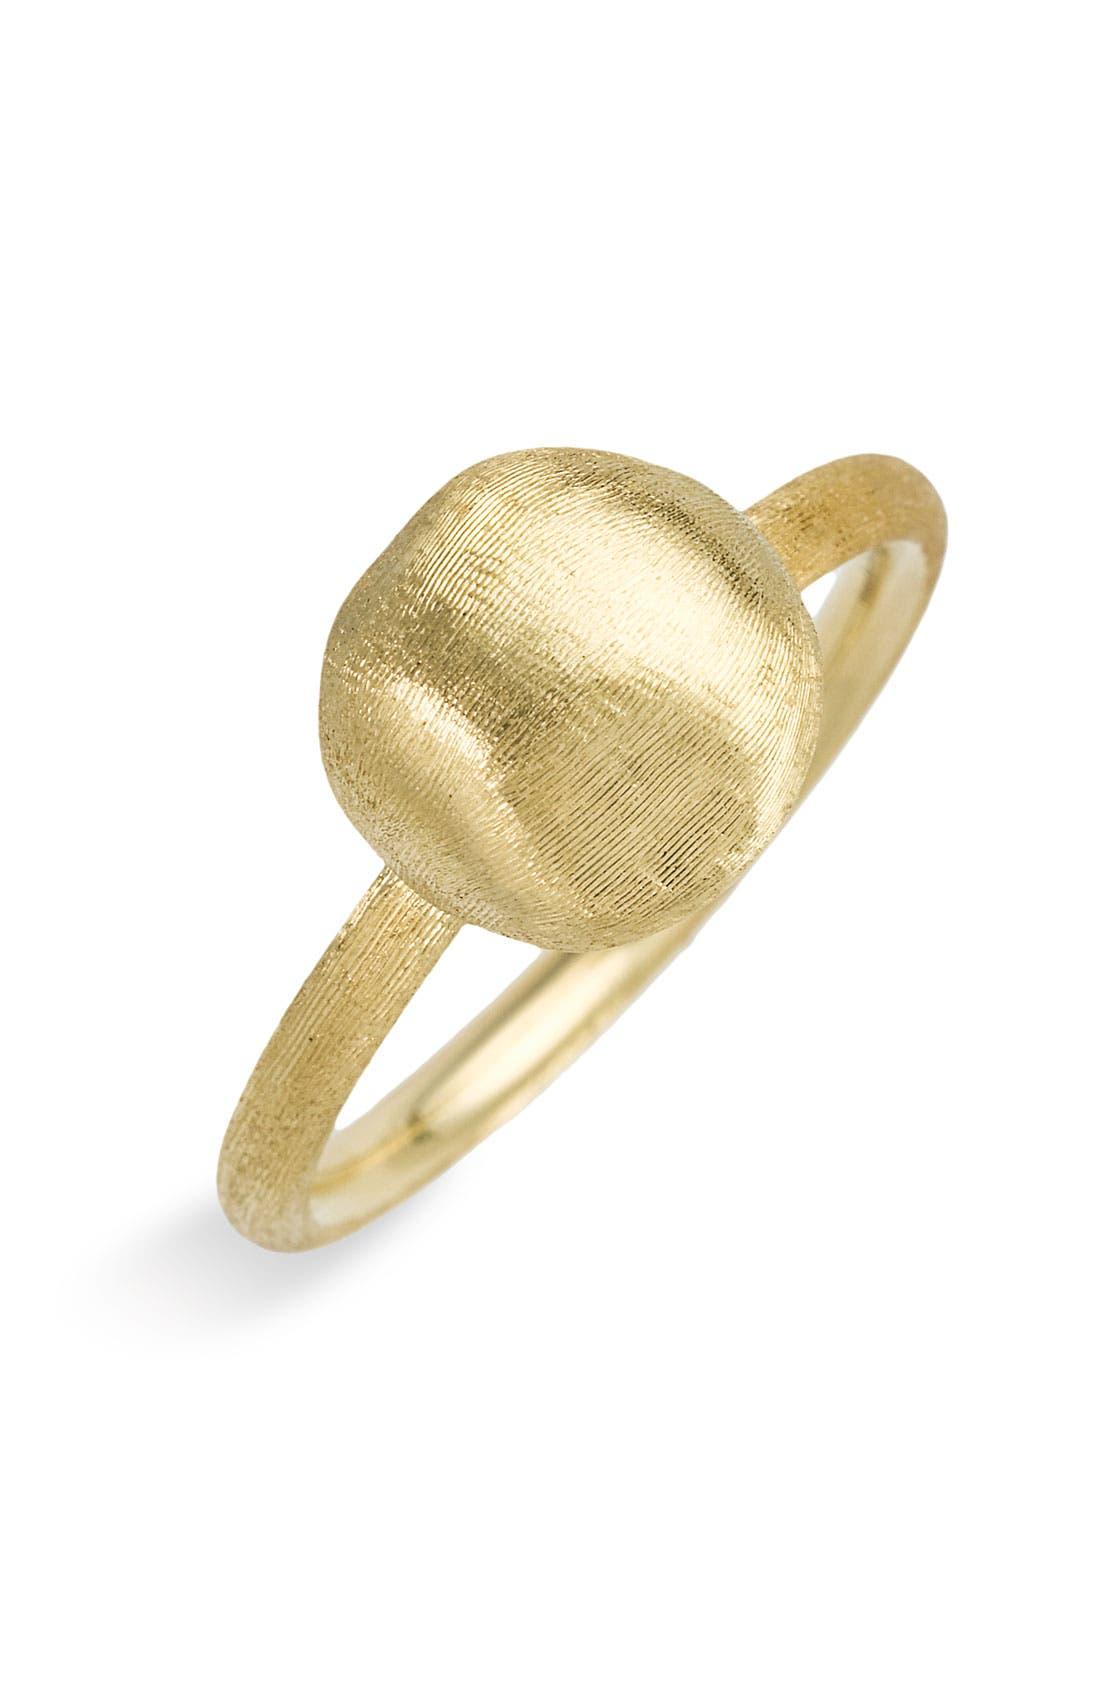 'Africa Gold' Ball Ring,                             Main thumbnail 1, color,                             710